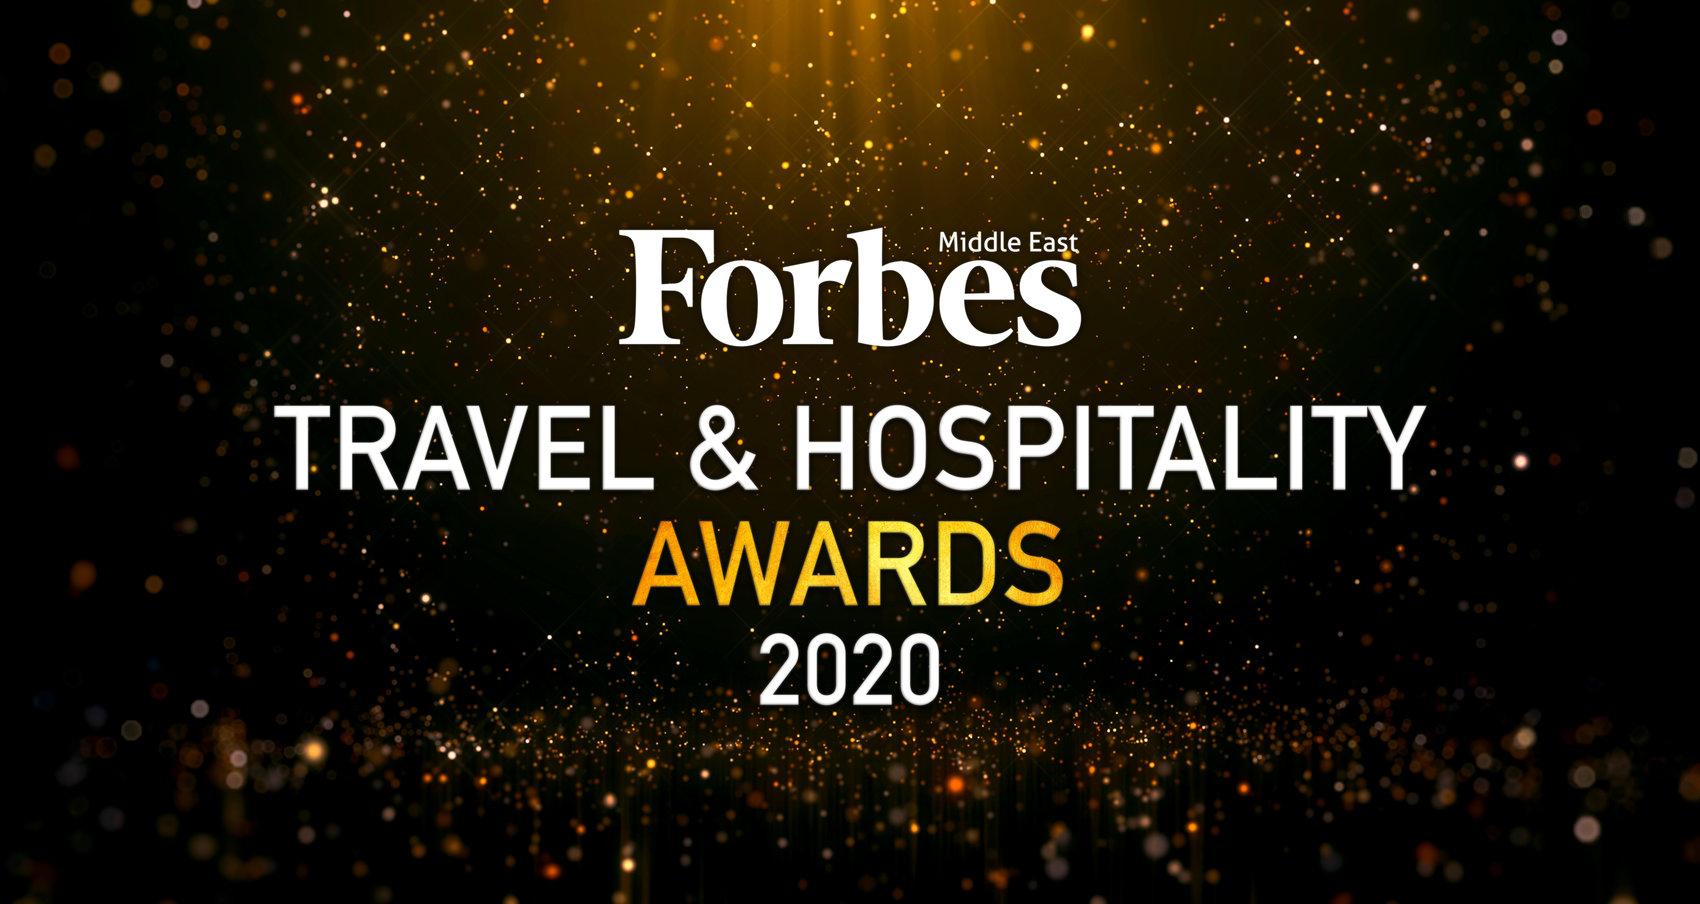 Travel & Hospitality Awards 2020 Nominations